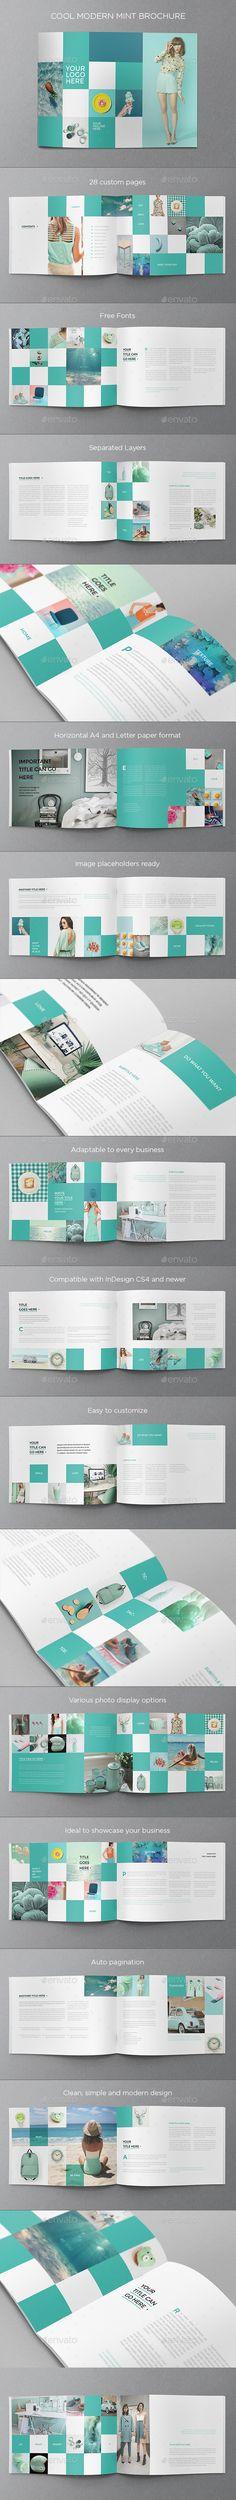 Cool Minimal Mint Brochure - Brochures Print Templates